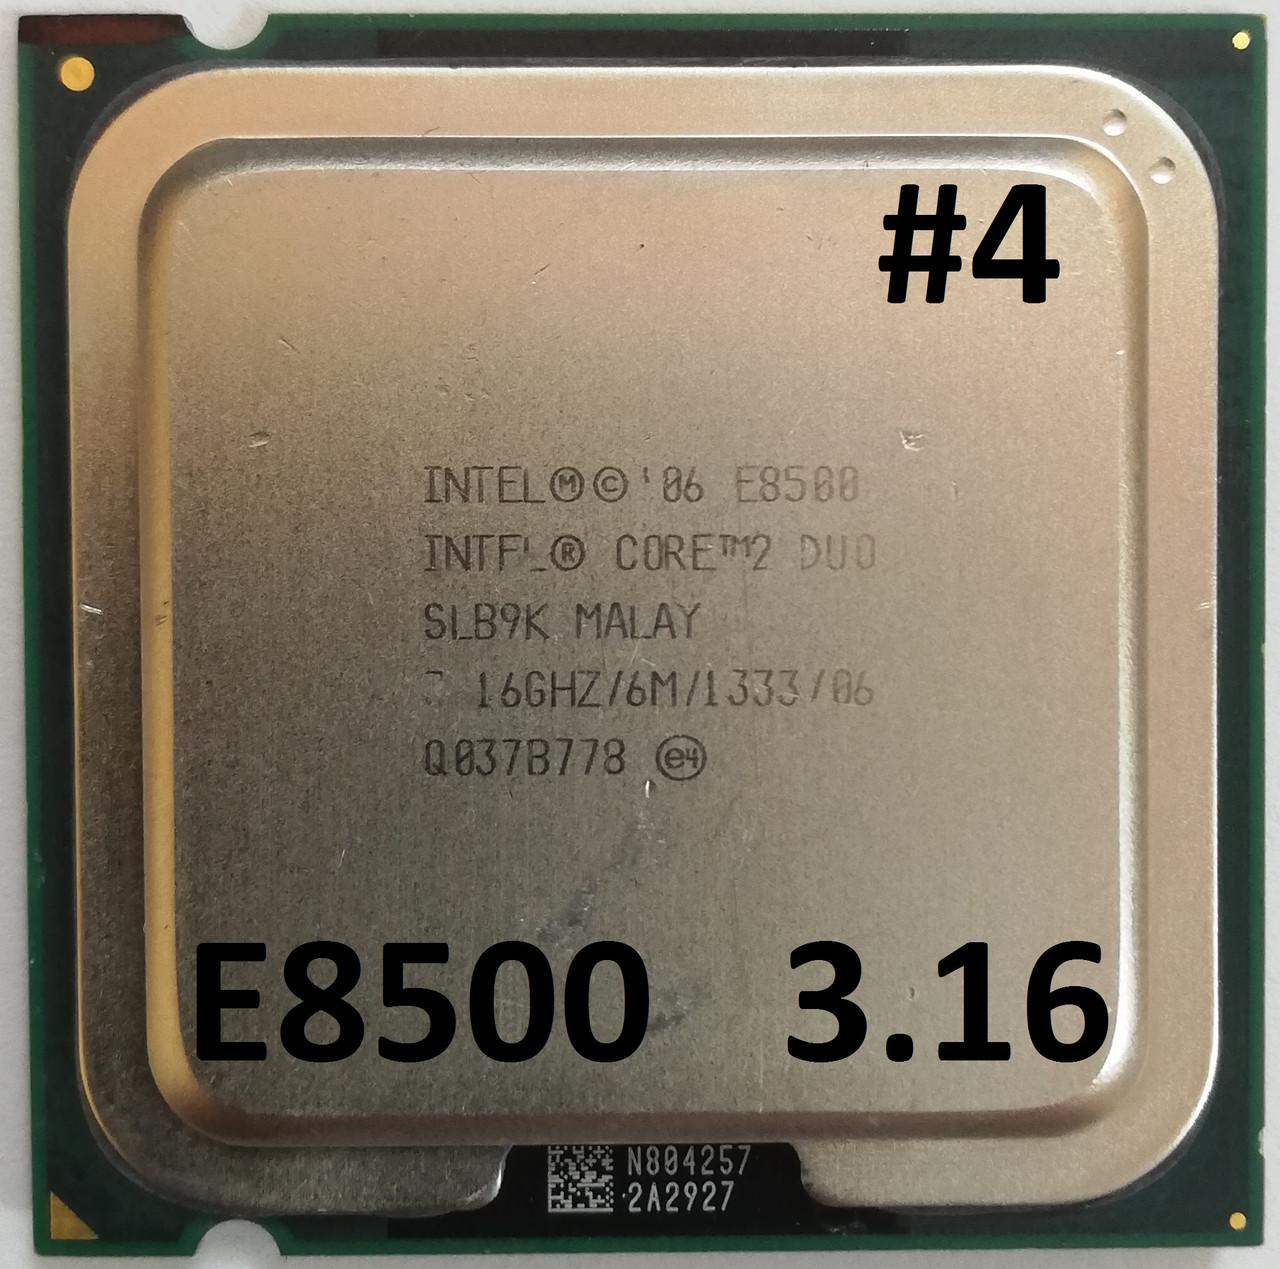 Процессор ЛОТ #4 Intel Core 2 Duo E8500 E0 SLB9K 3.16 GHz 6 MB Cache 1333 MHz FSB Socket 775 Б/У